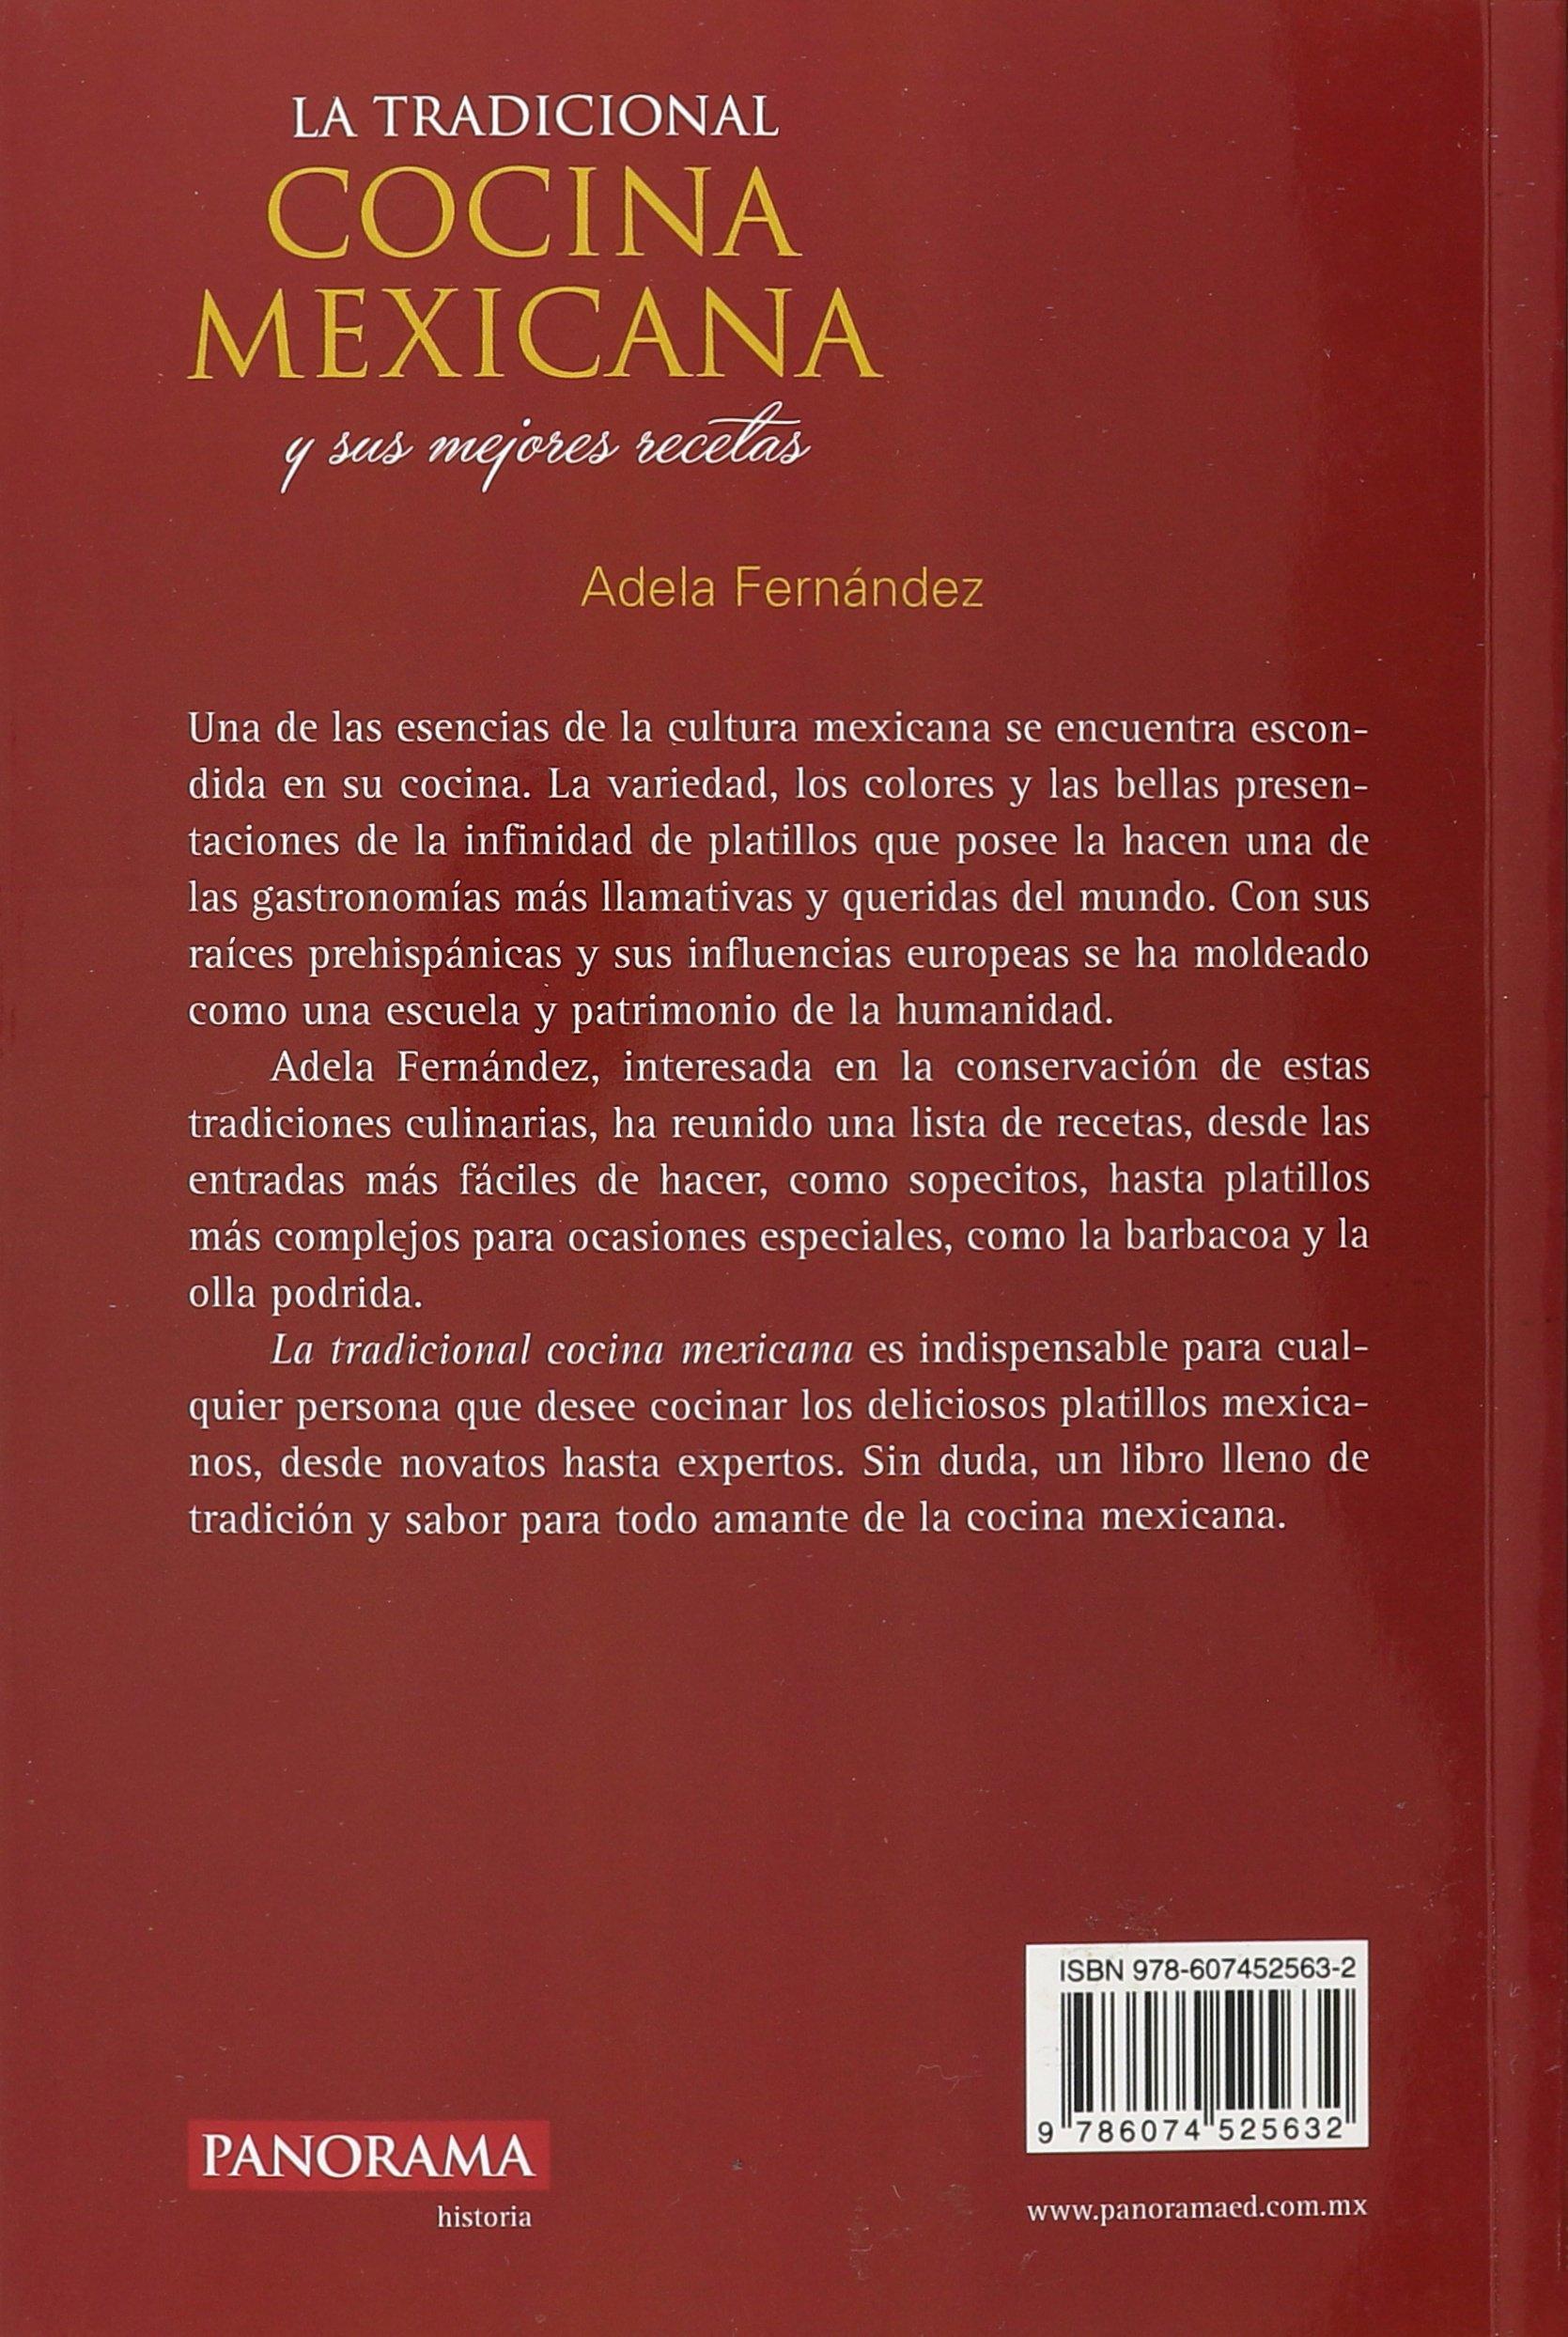 La tradicional cocina Mexicana (Spanish Edition): Adela Fernández: 9786074525632: Amazon.com: Books